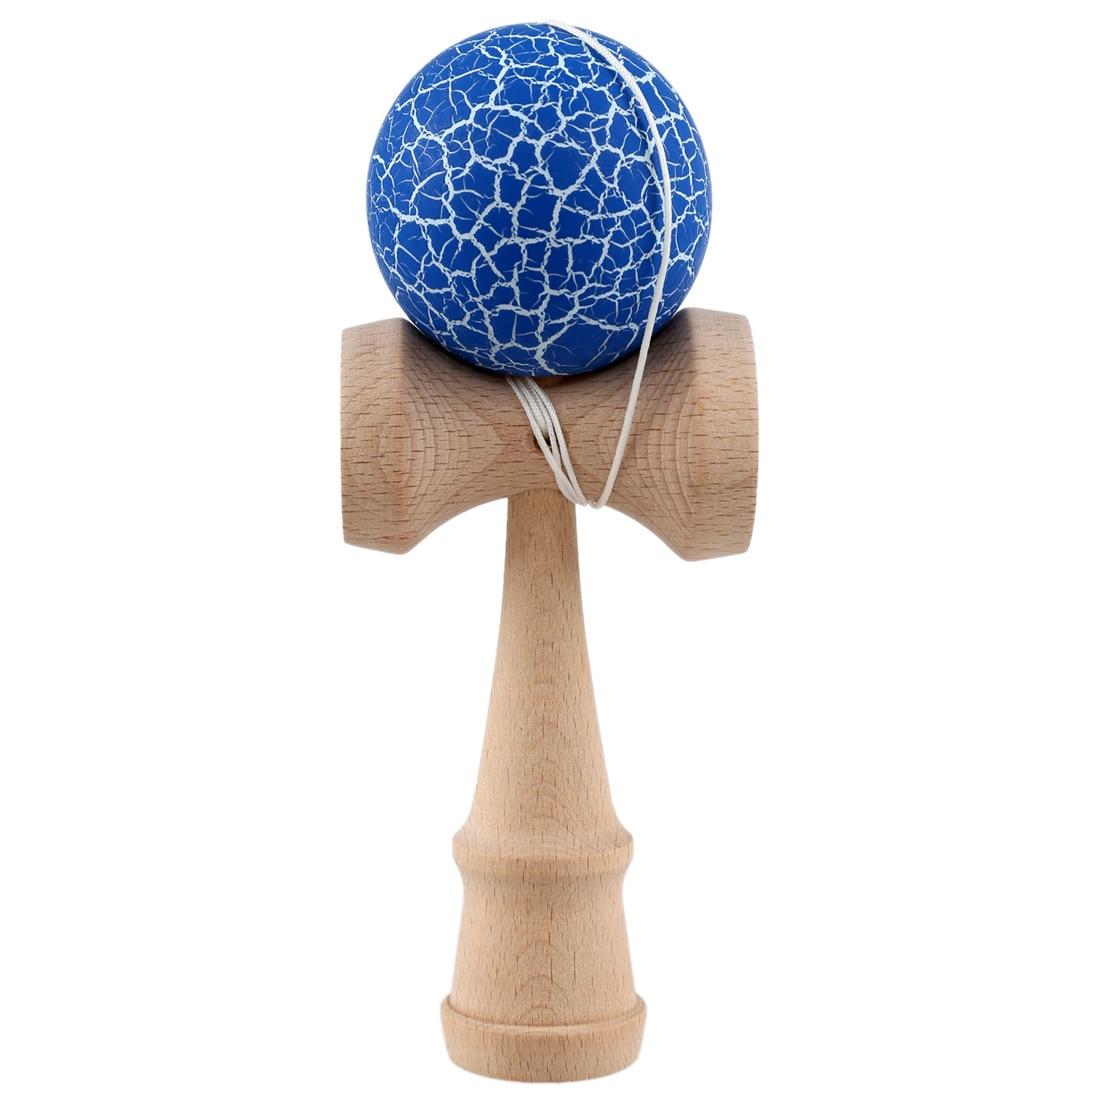 Pintara grietas Kendama Bola de malabares Juego de Pelota tradicional japonés juguete juguetes educativos para niños-azul